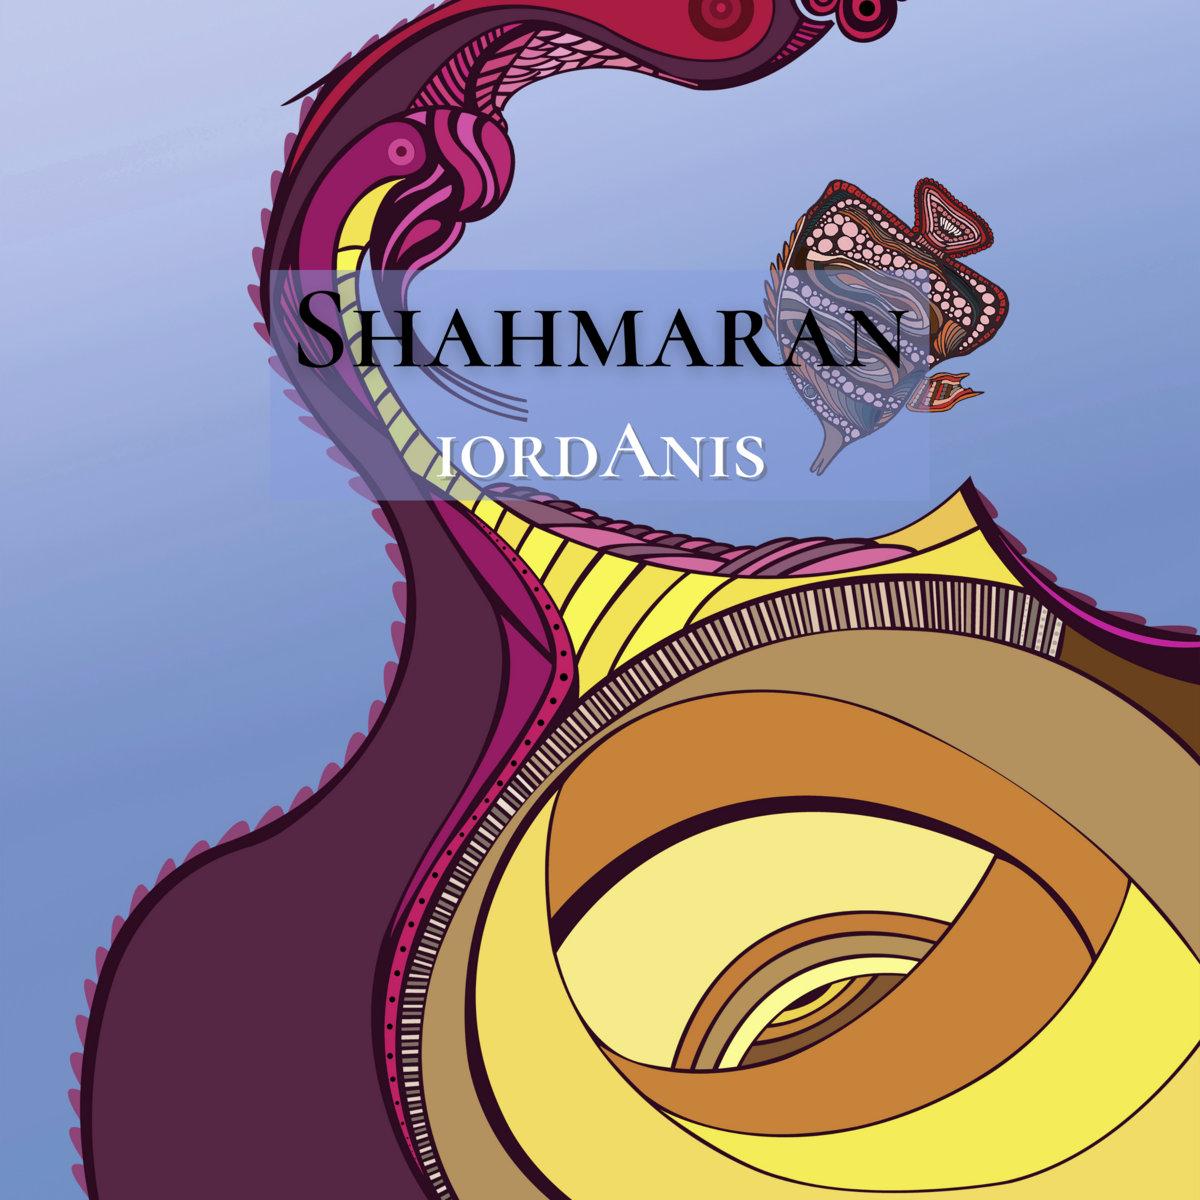 Shahmaran by iordAnis